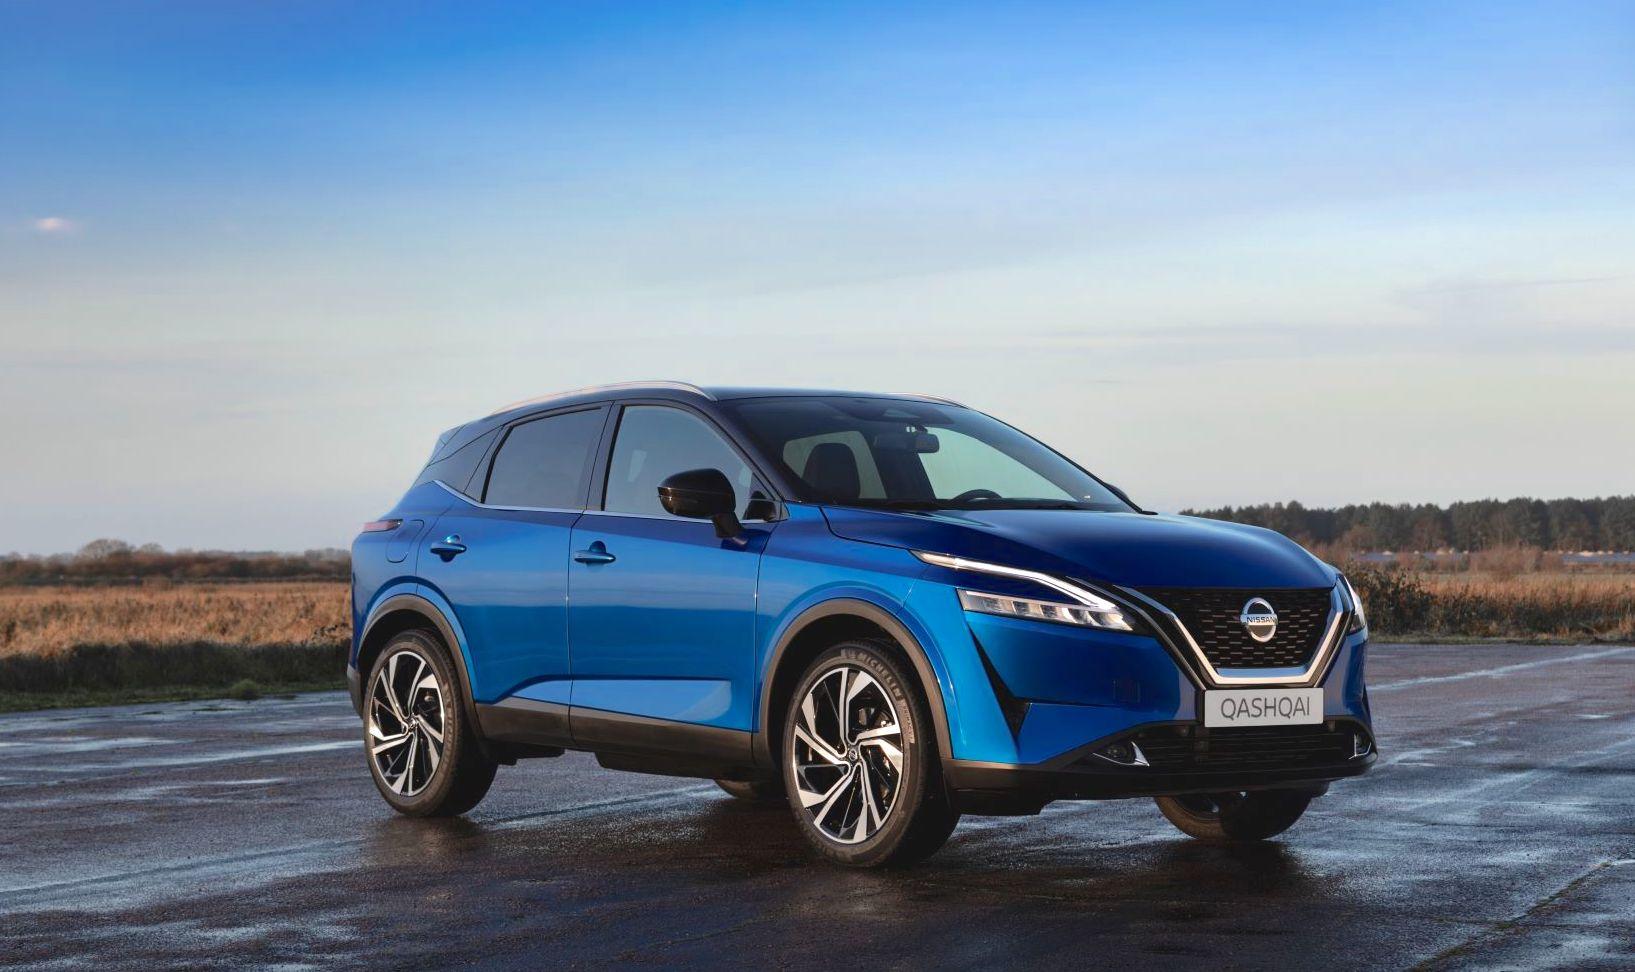 Nissan unveils new electrified Qashqai